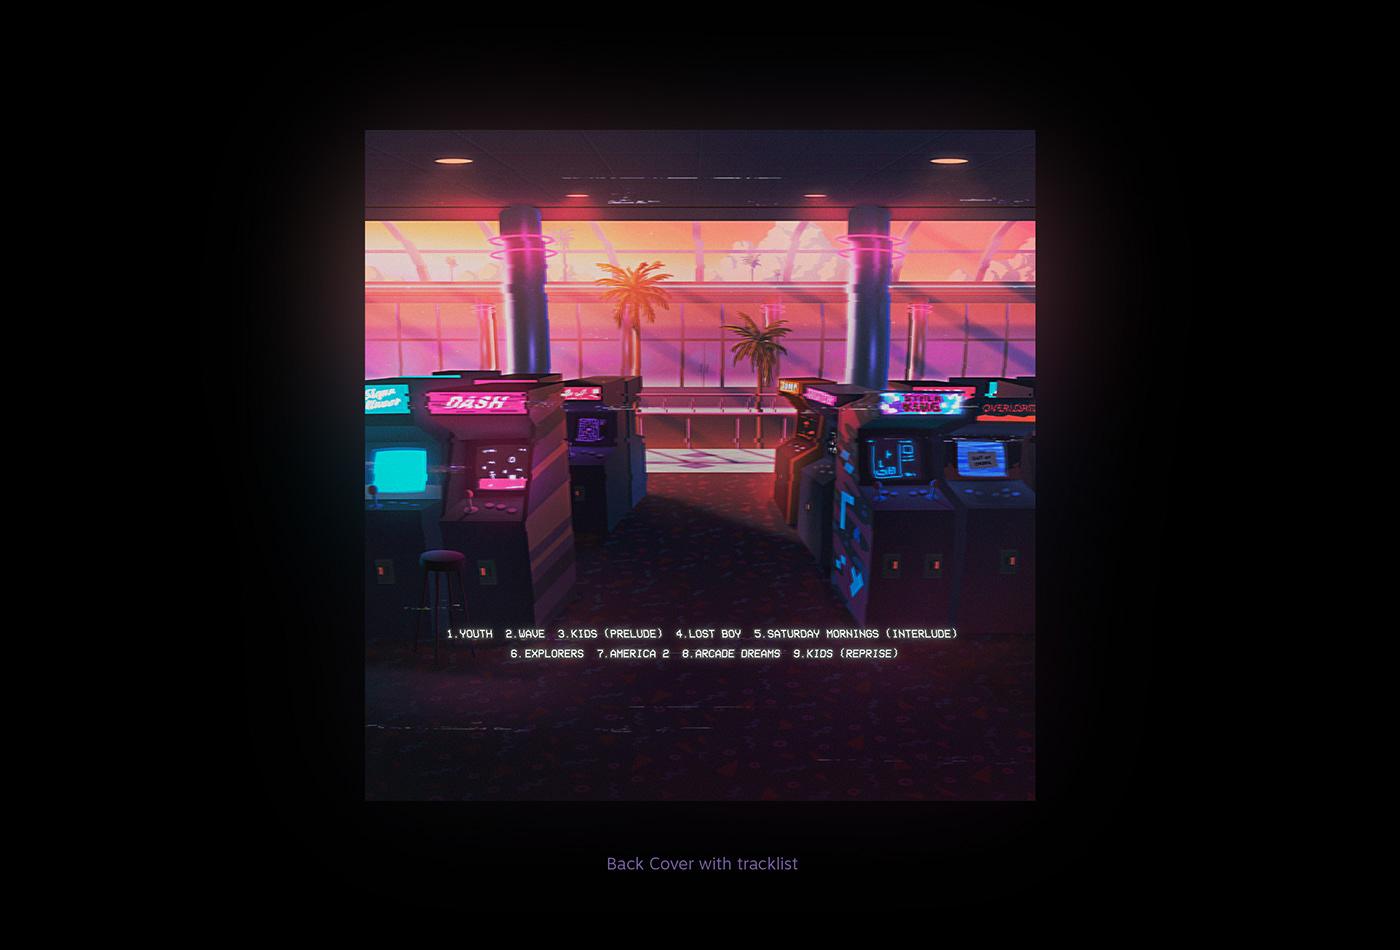 vaporwave vhs The midnight Retro album cover vinyl electronic music aesthetic 80's Synthwave